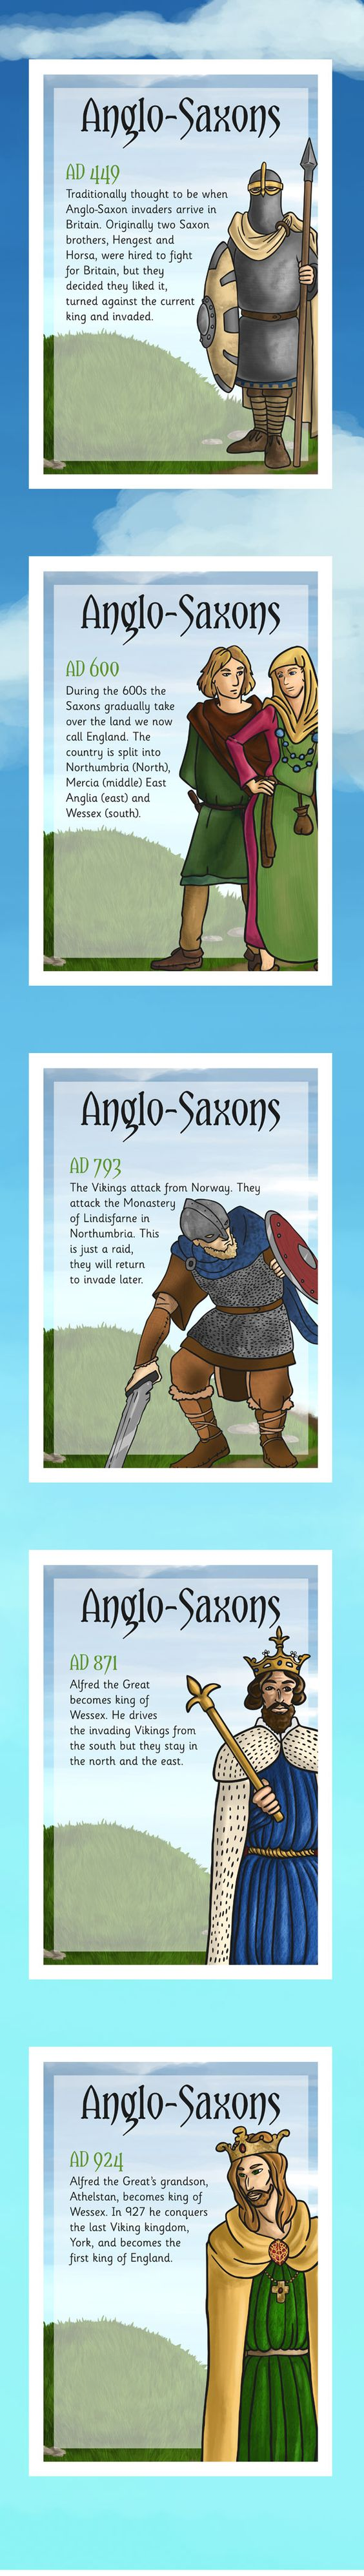 KS2 History Timelines- Anglo Saxons Timeline Posters